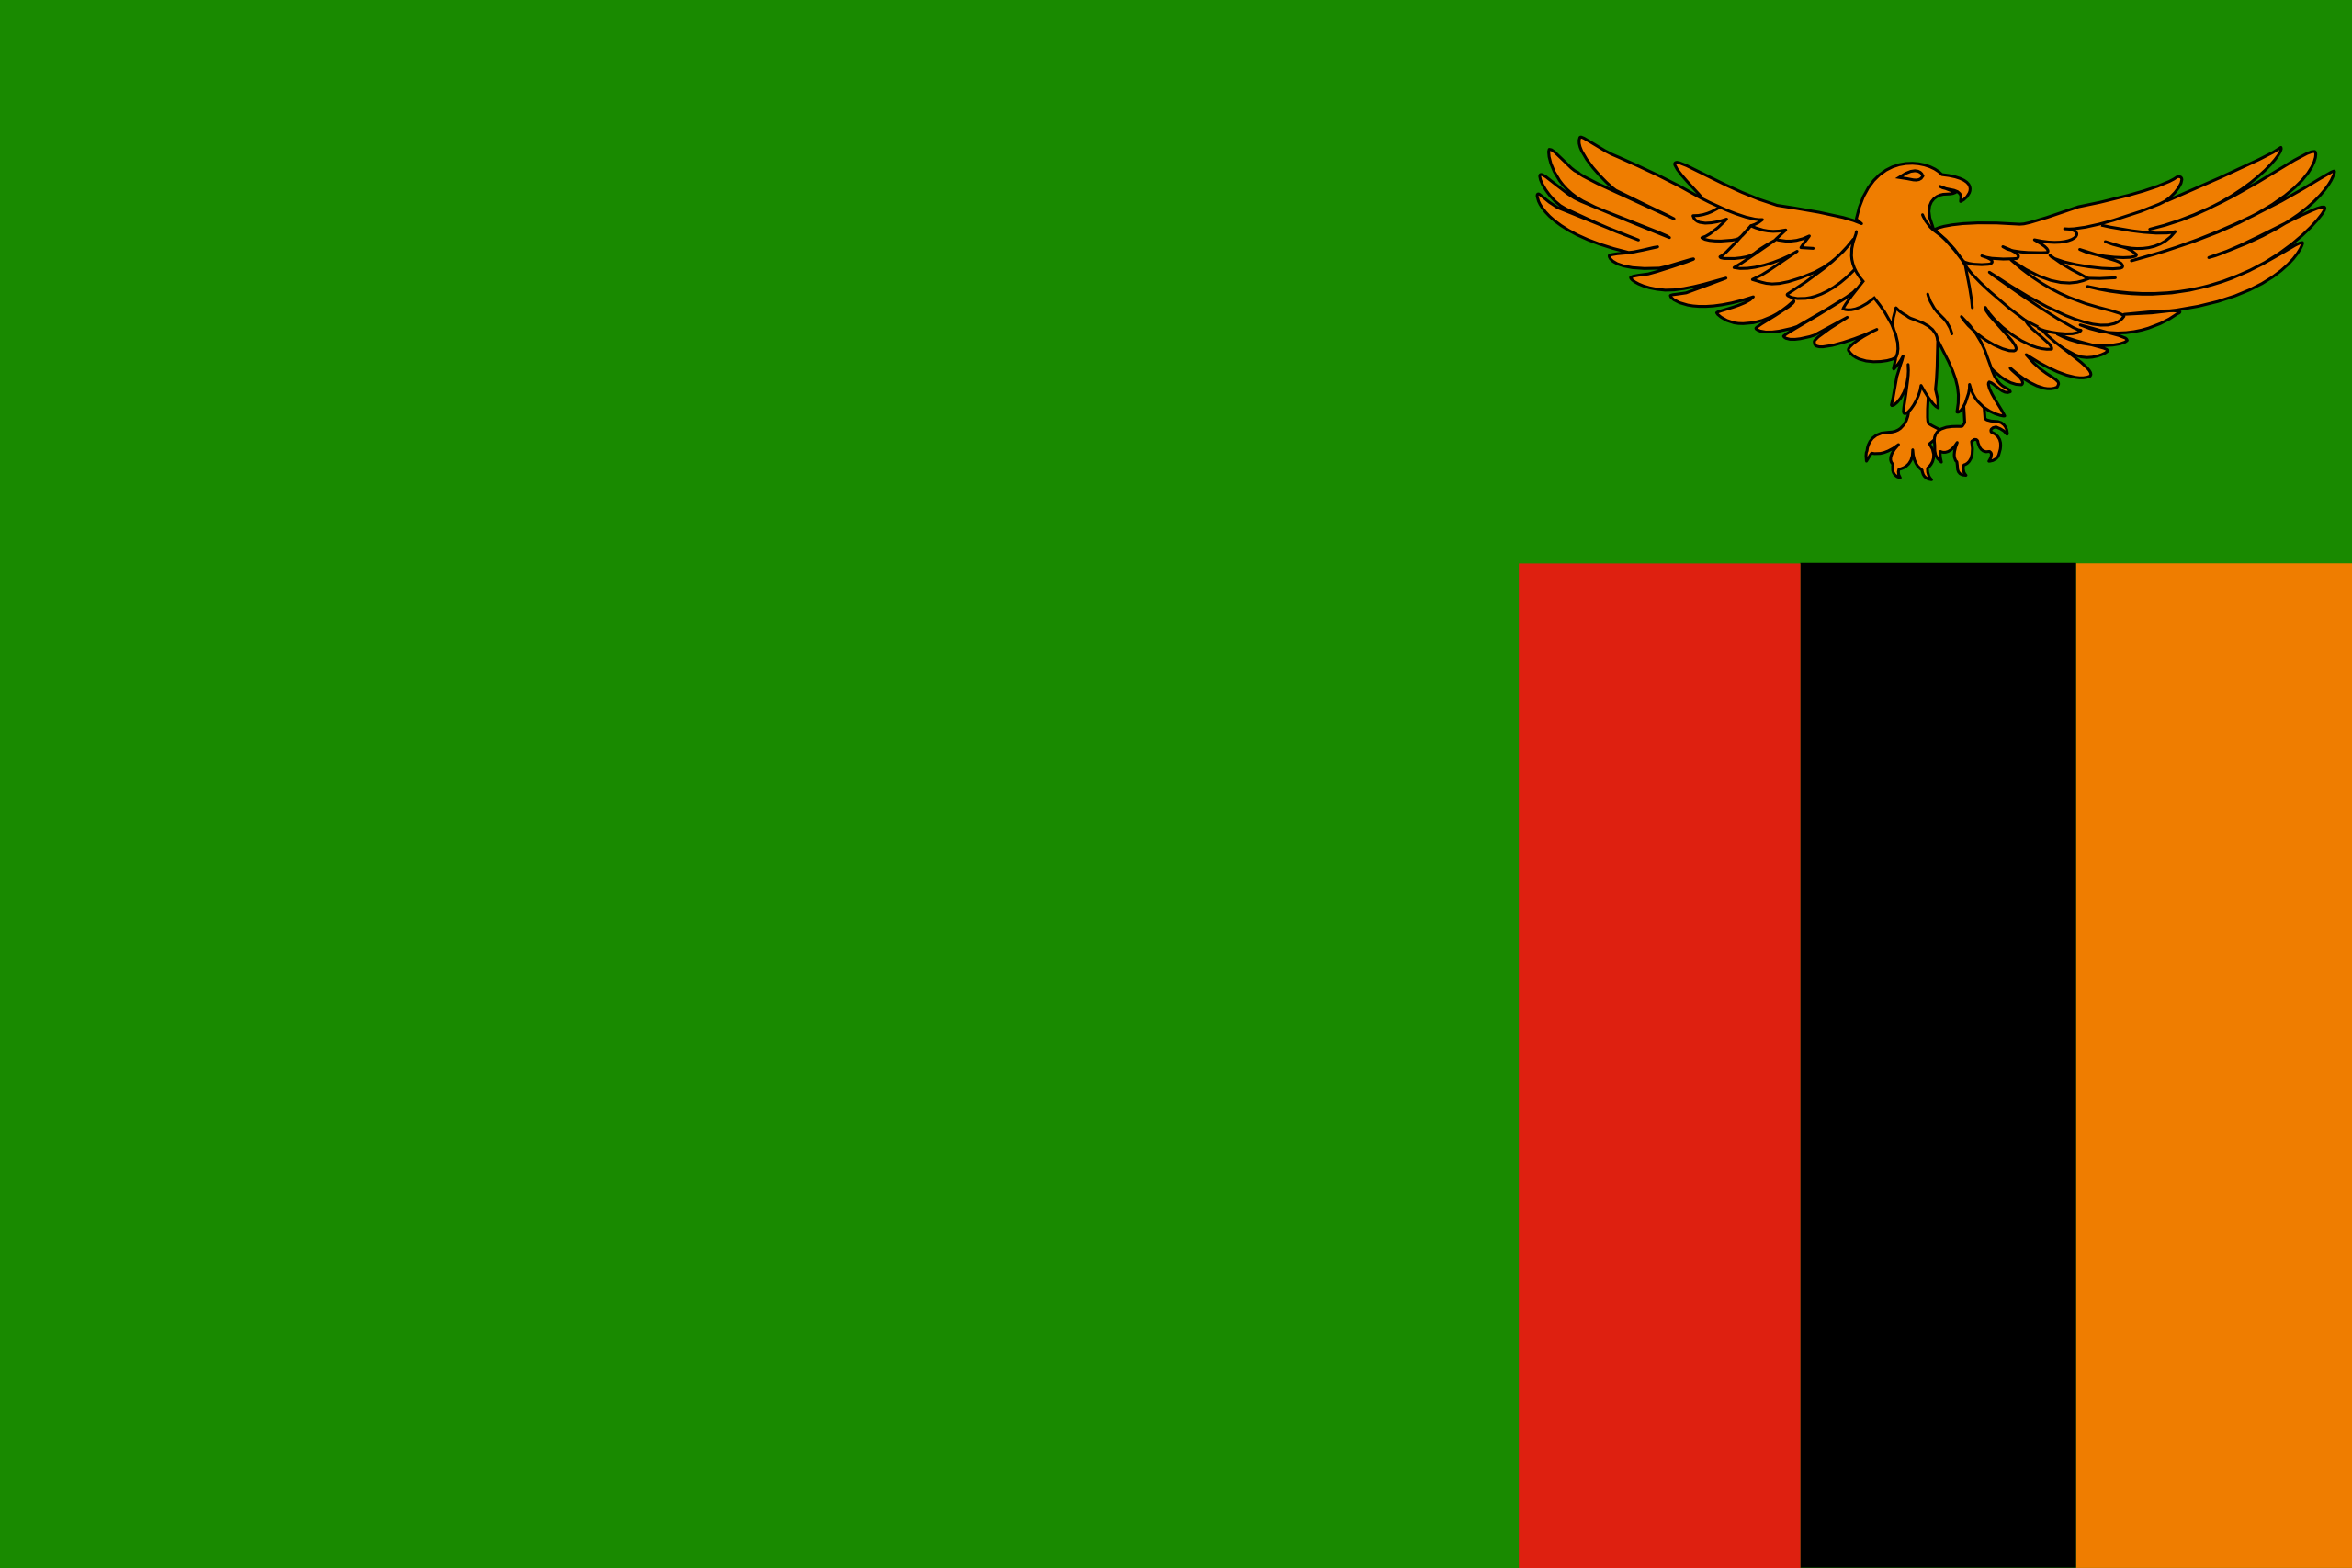 zambia, país, emblema, insignia, シンボル - HD の壁紙 - 教授-falken.com